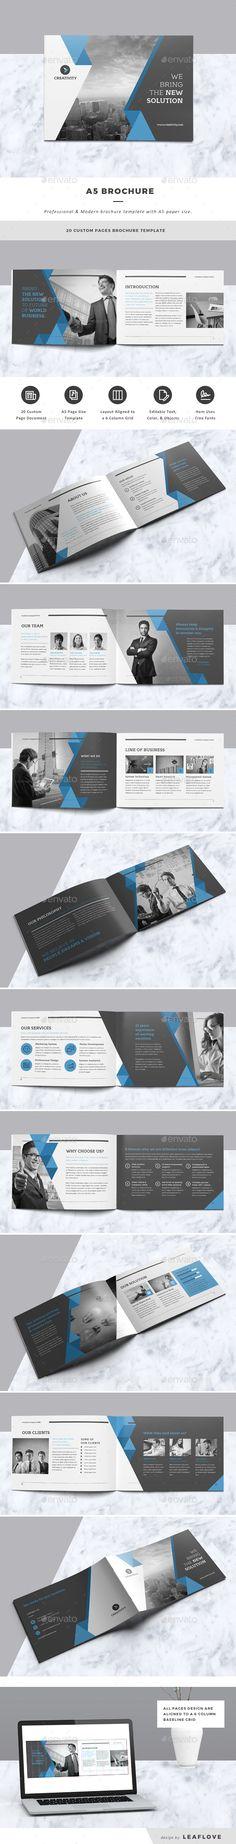 Brand Manual Brand manual, Corporate brochure and Brochures - product manual template